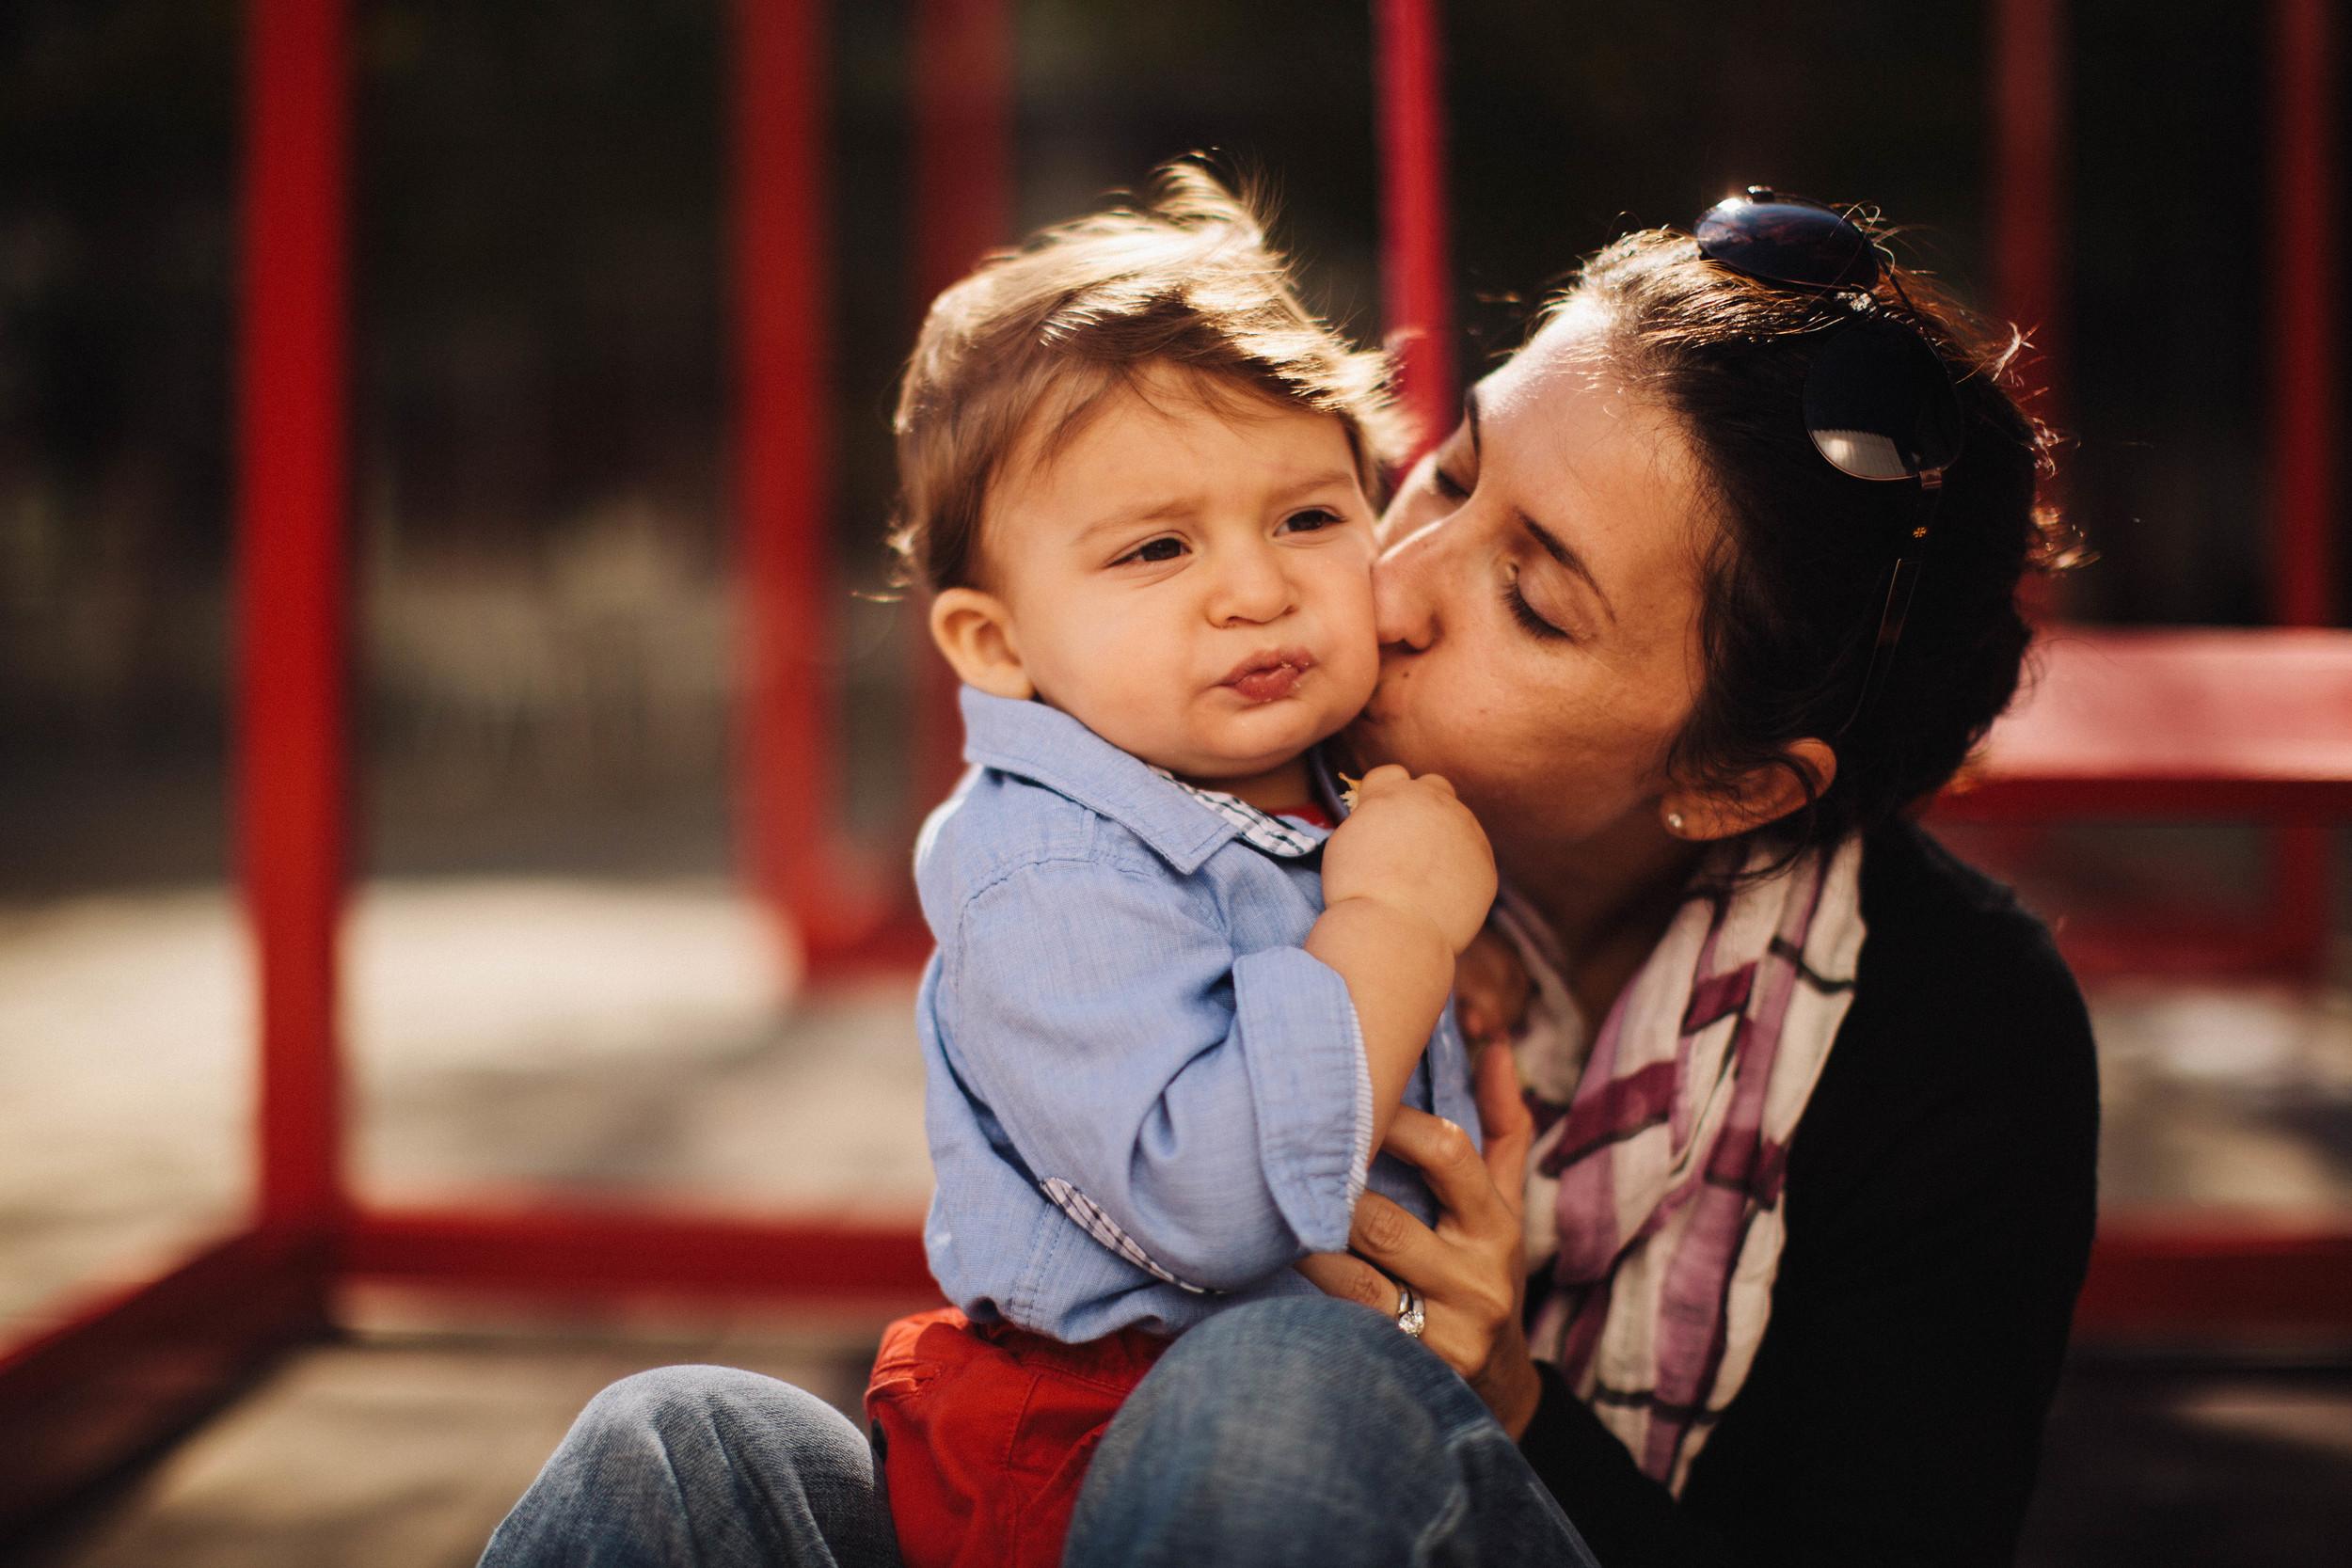 AJ_mom-1997.jpg